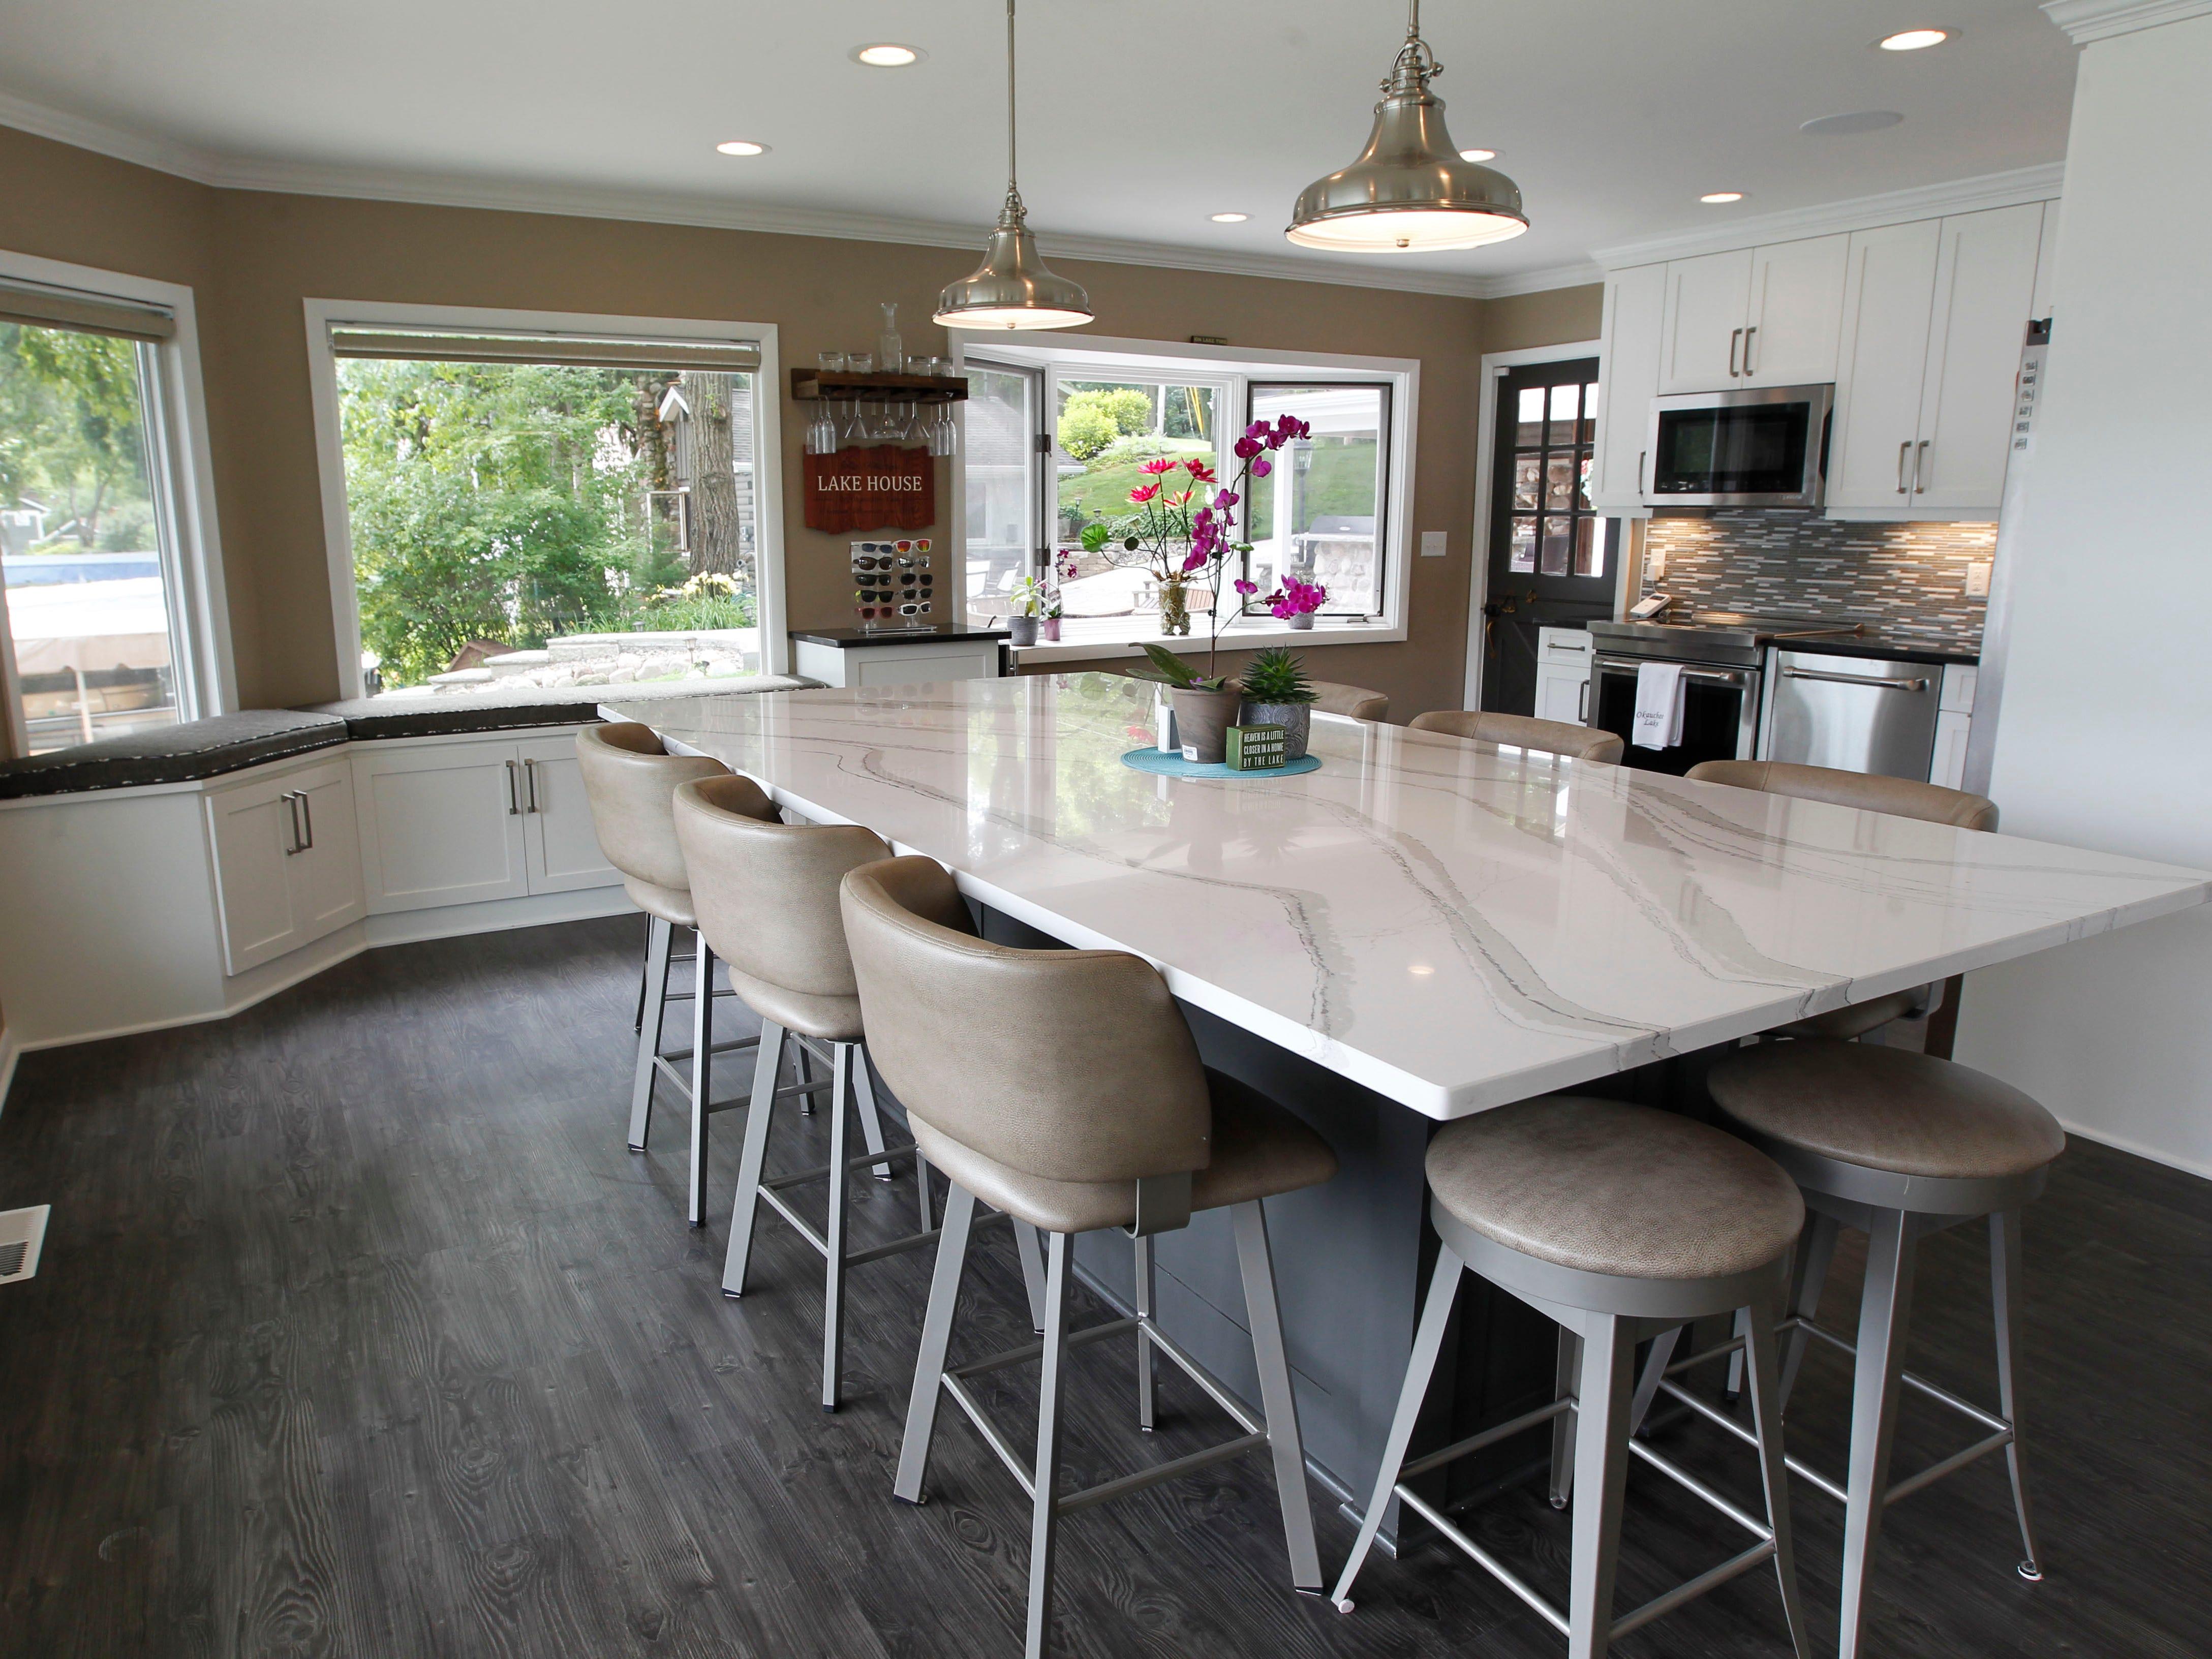 The large kitchen island seats 10.